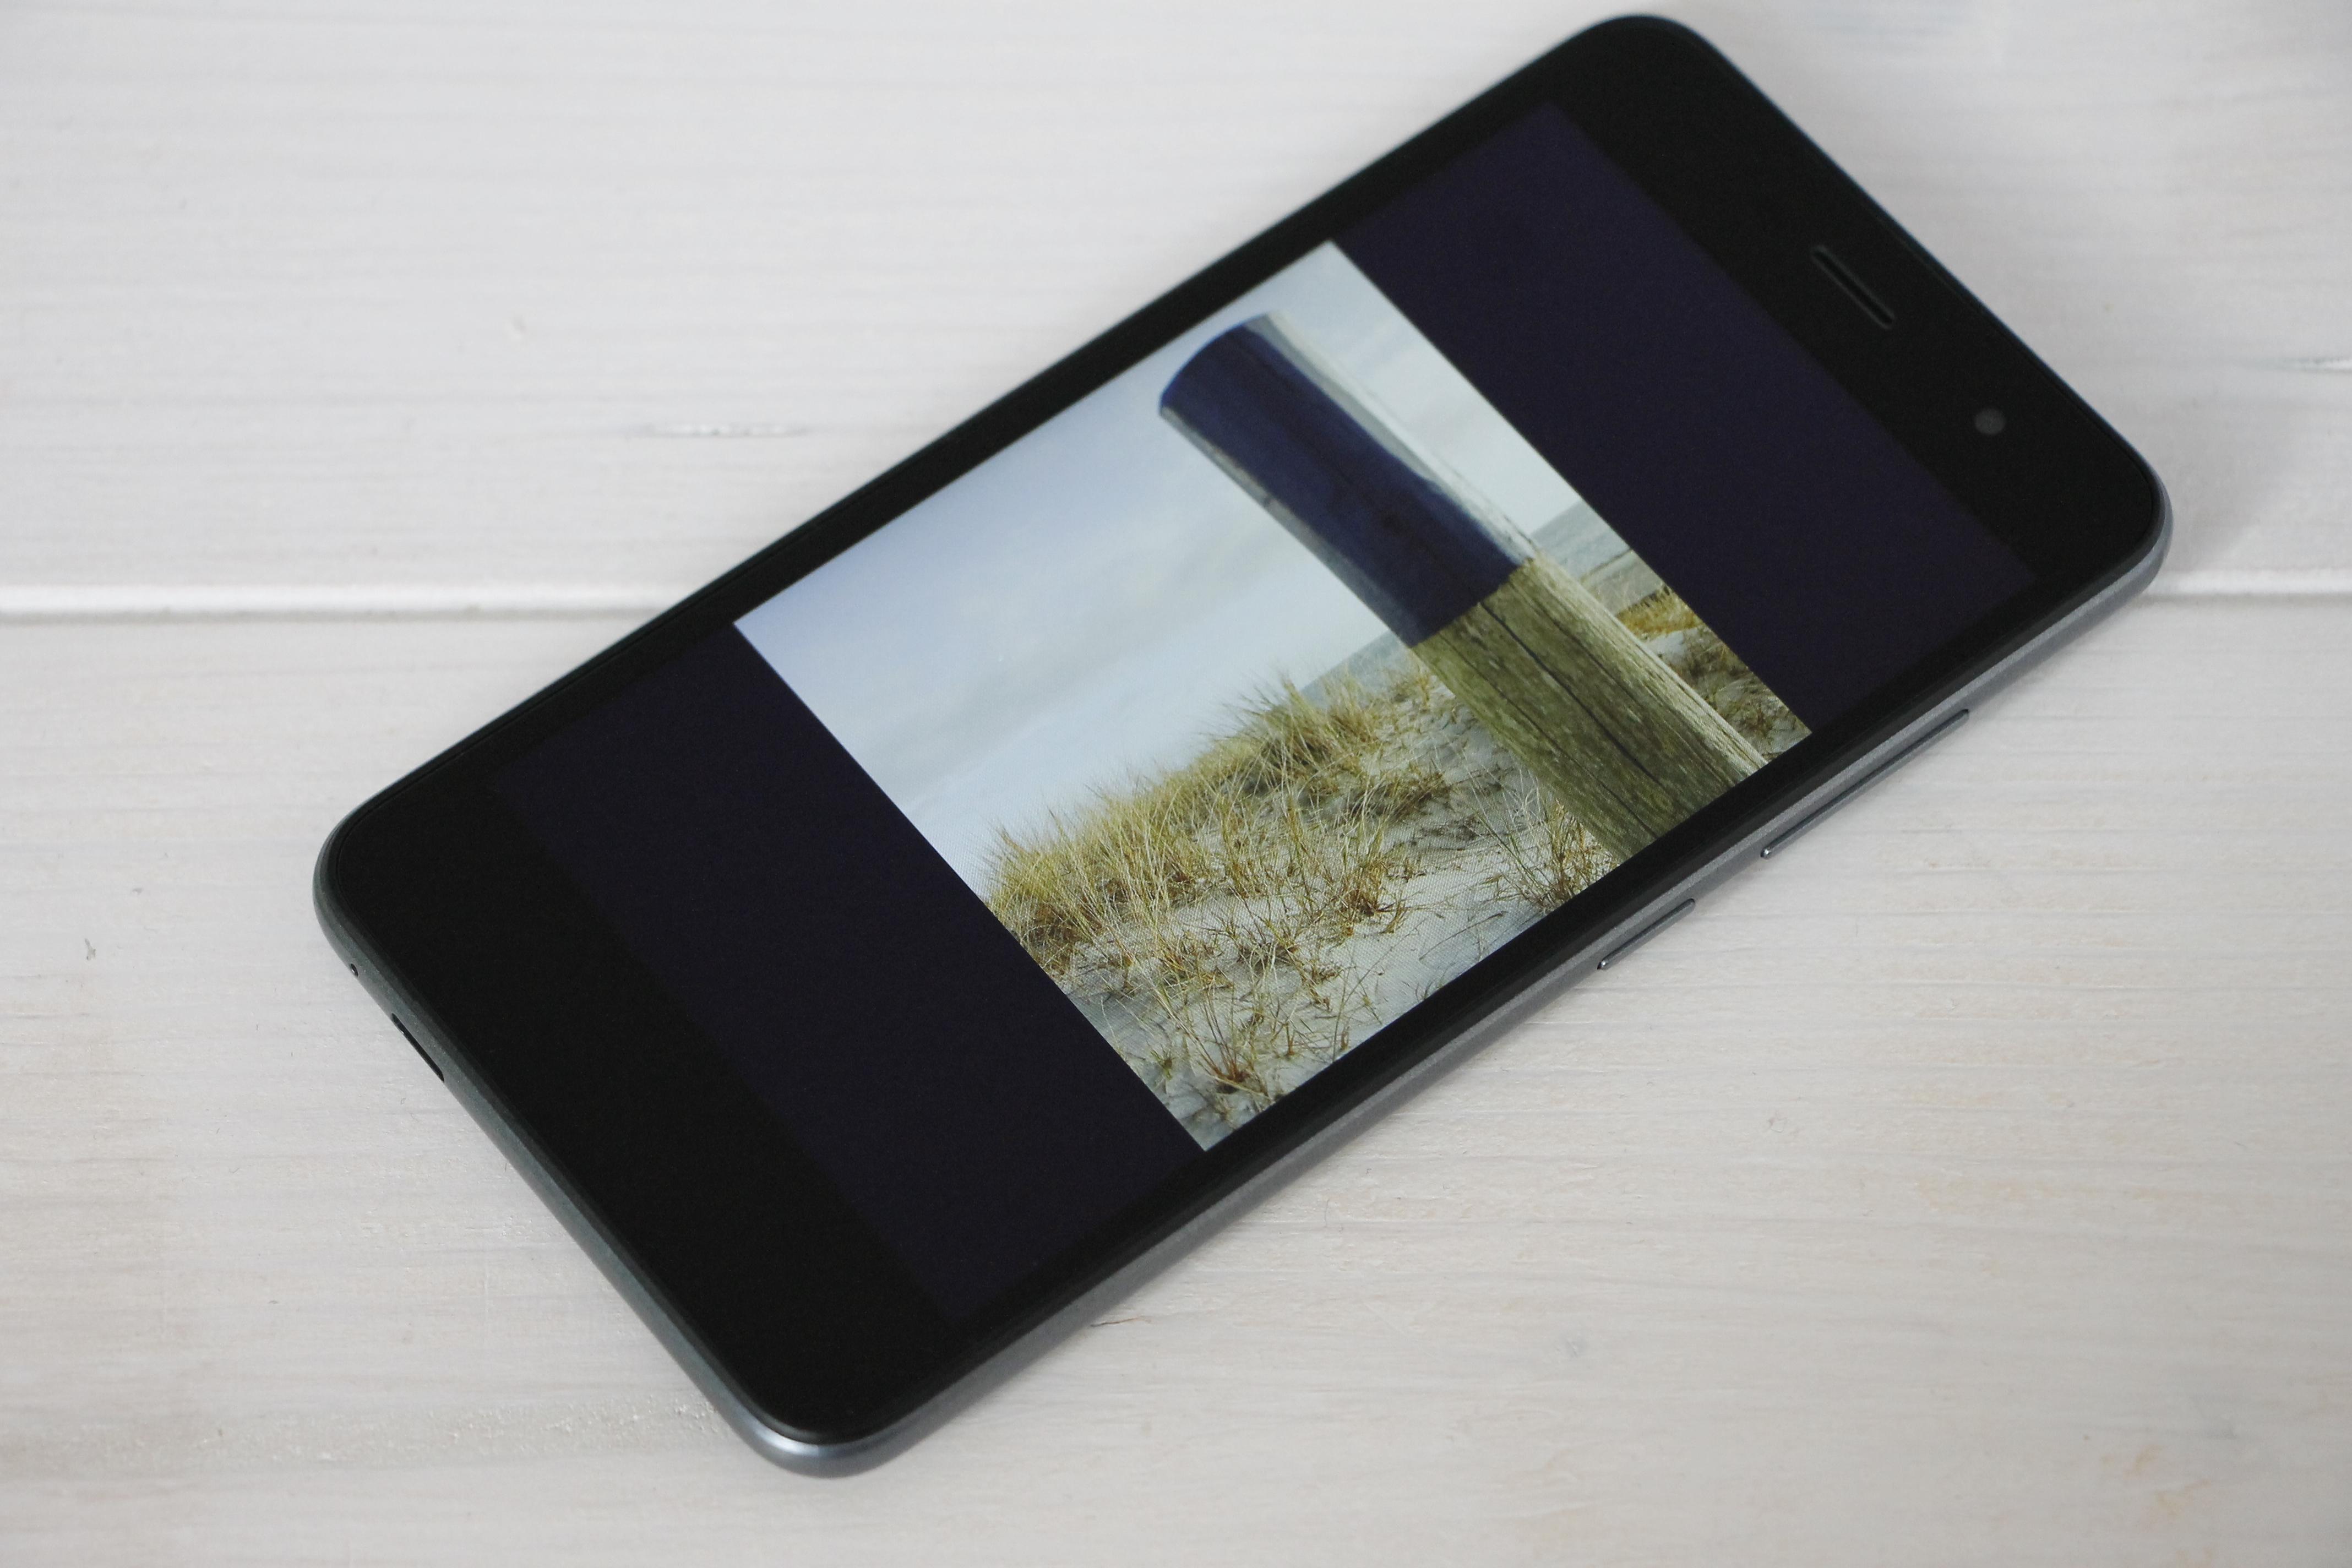 das gigaset smartphone gs160 im test inkl gewinnspiel. Black Bedroom Furniture Sets. Home Design Ideas